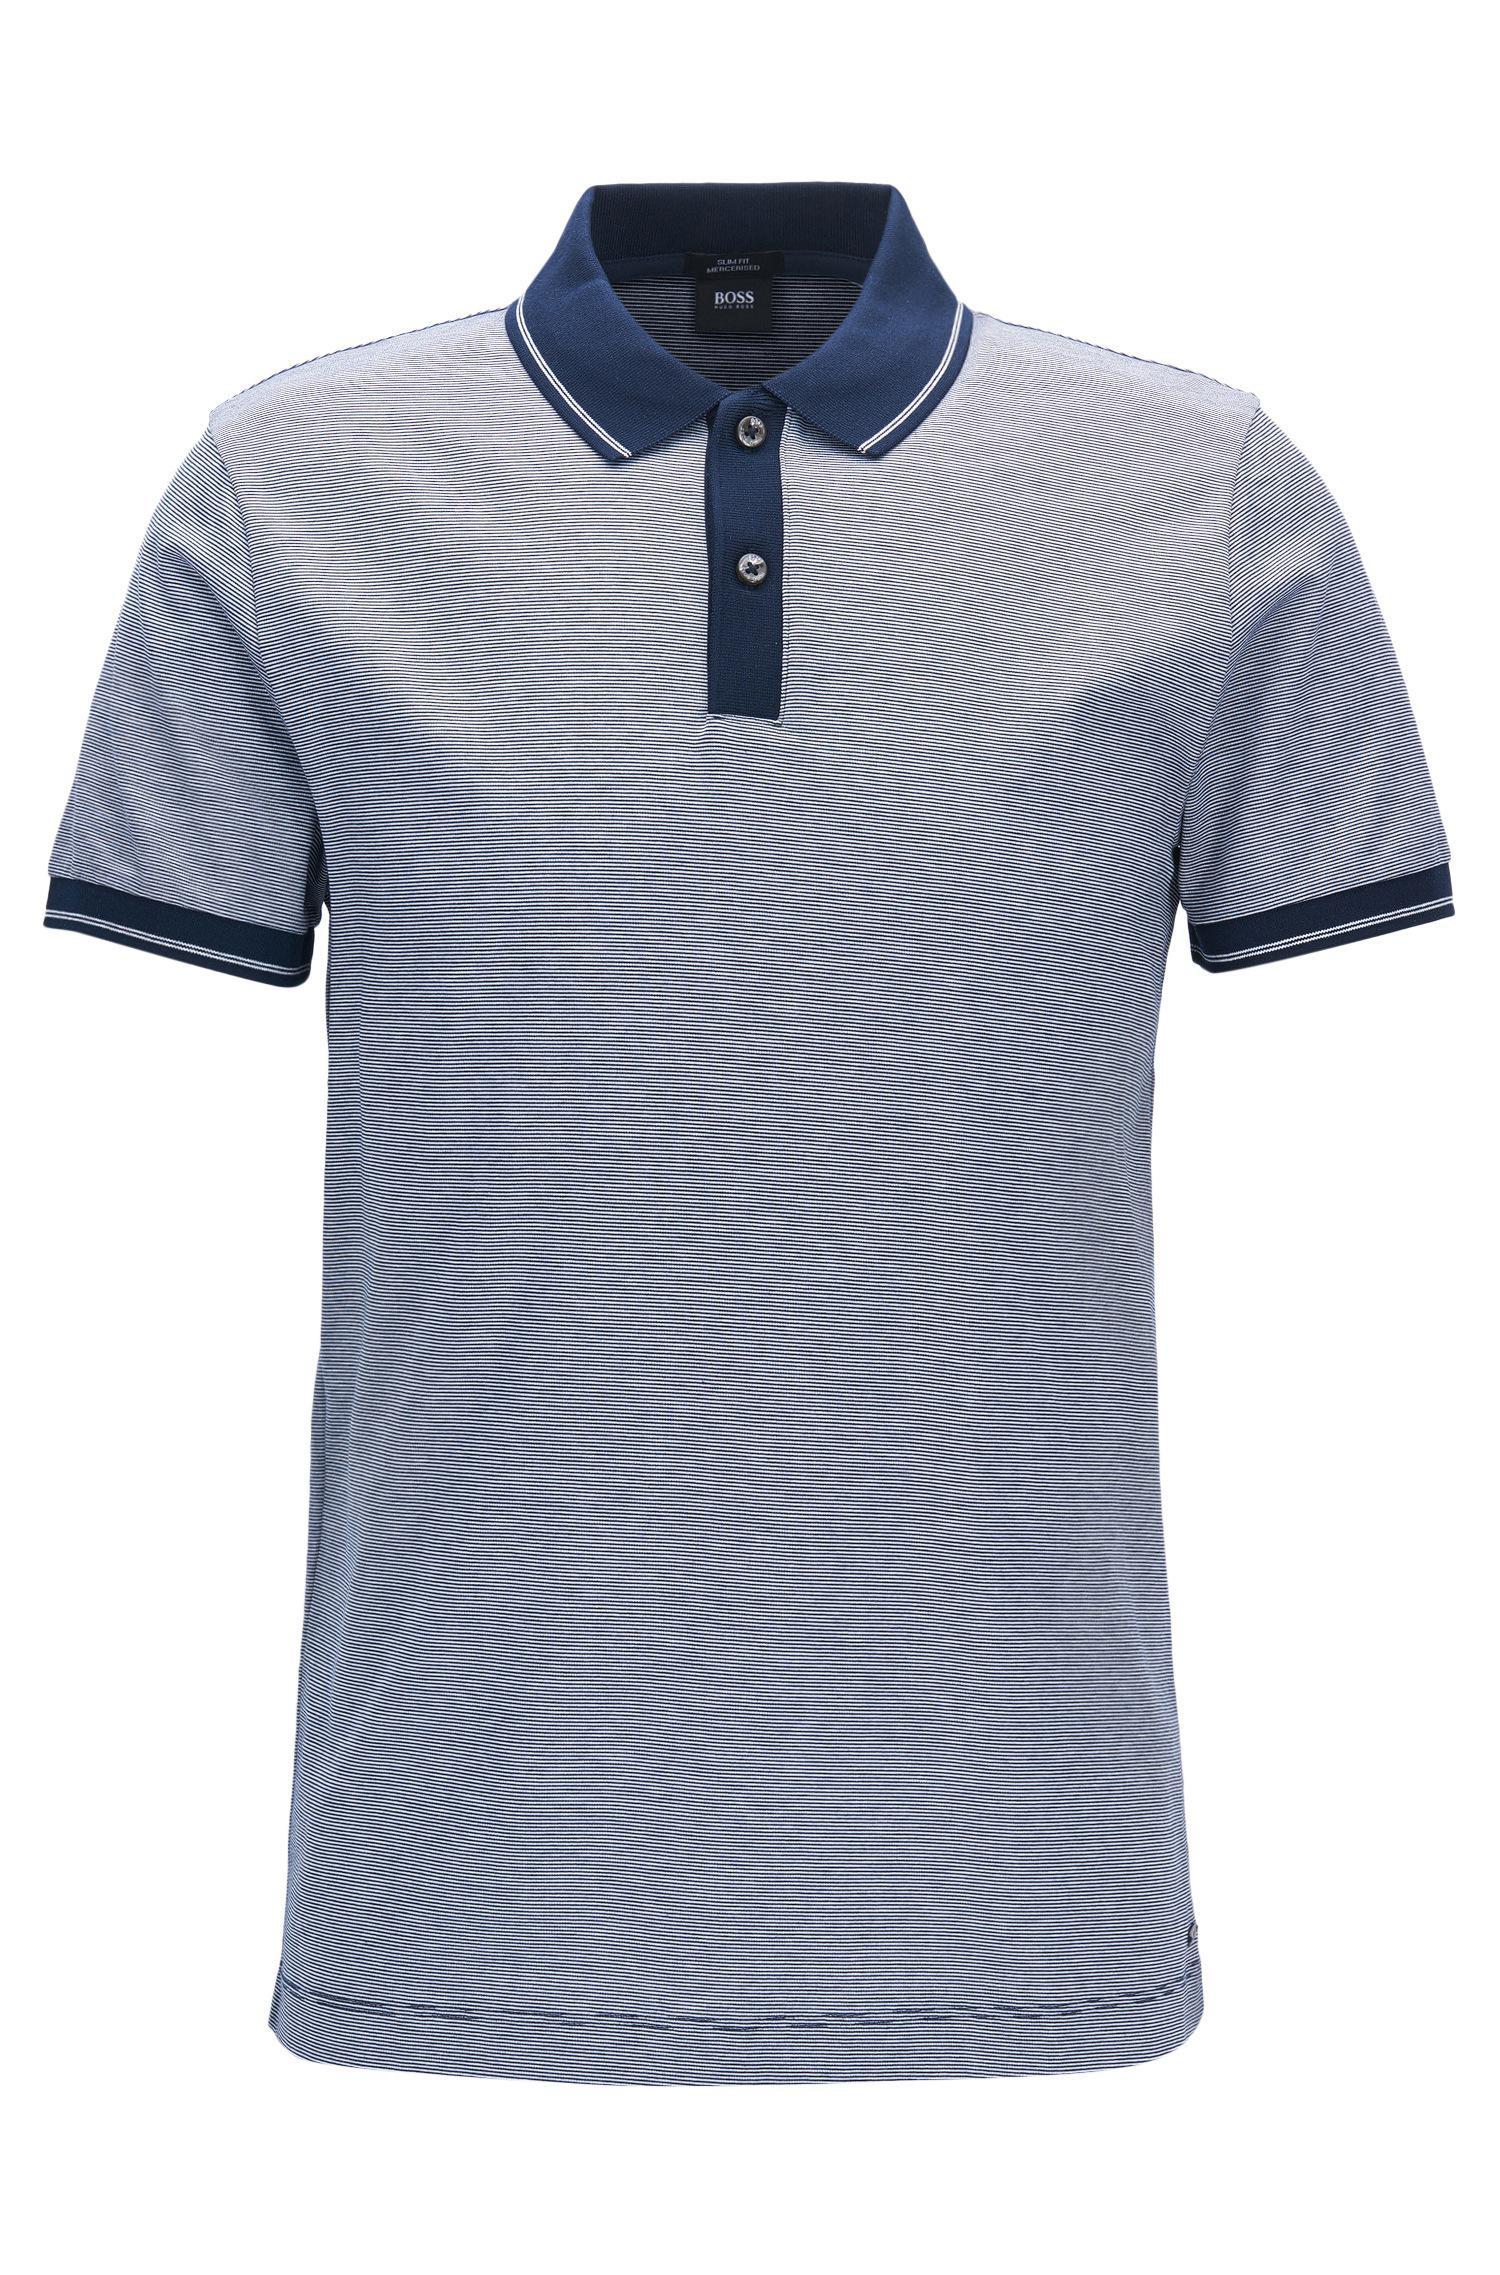 d41b3d58 BOSS Mercerized Cotton Polo Shirt, Slim Fit | Phillipson in Blue for ...